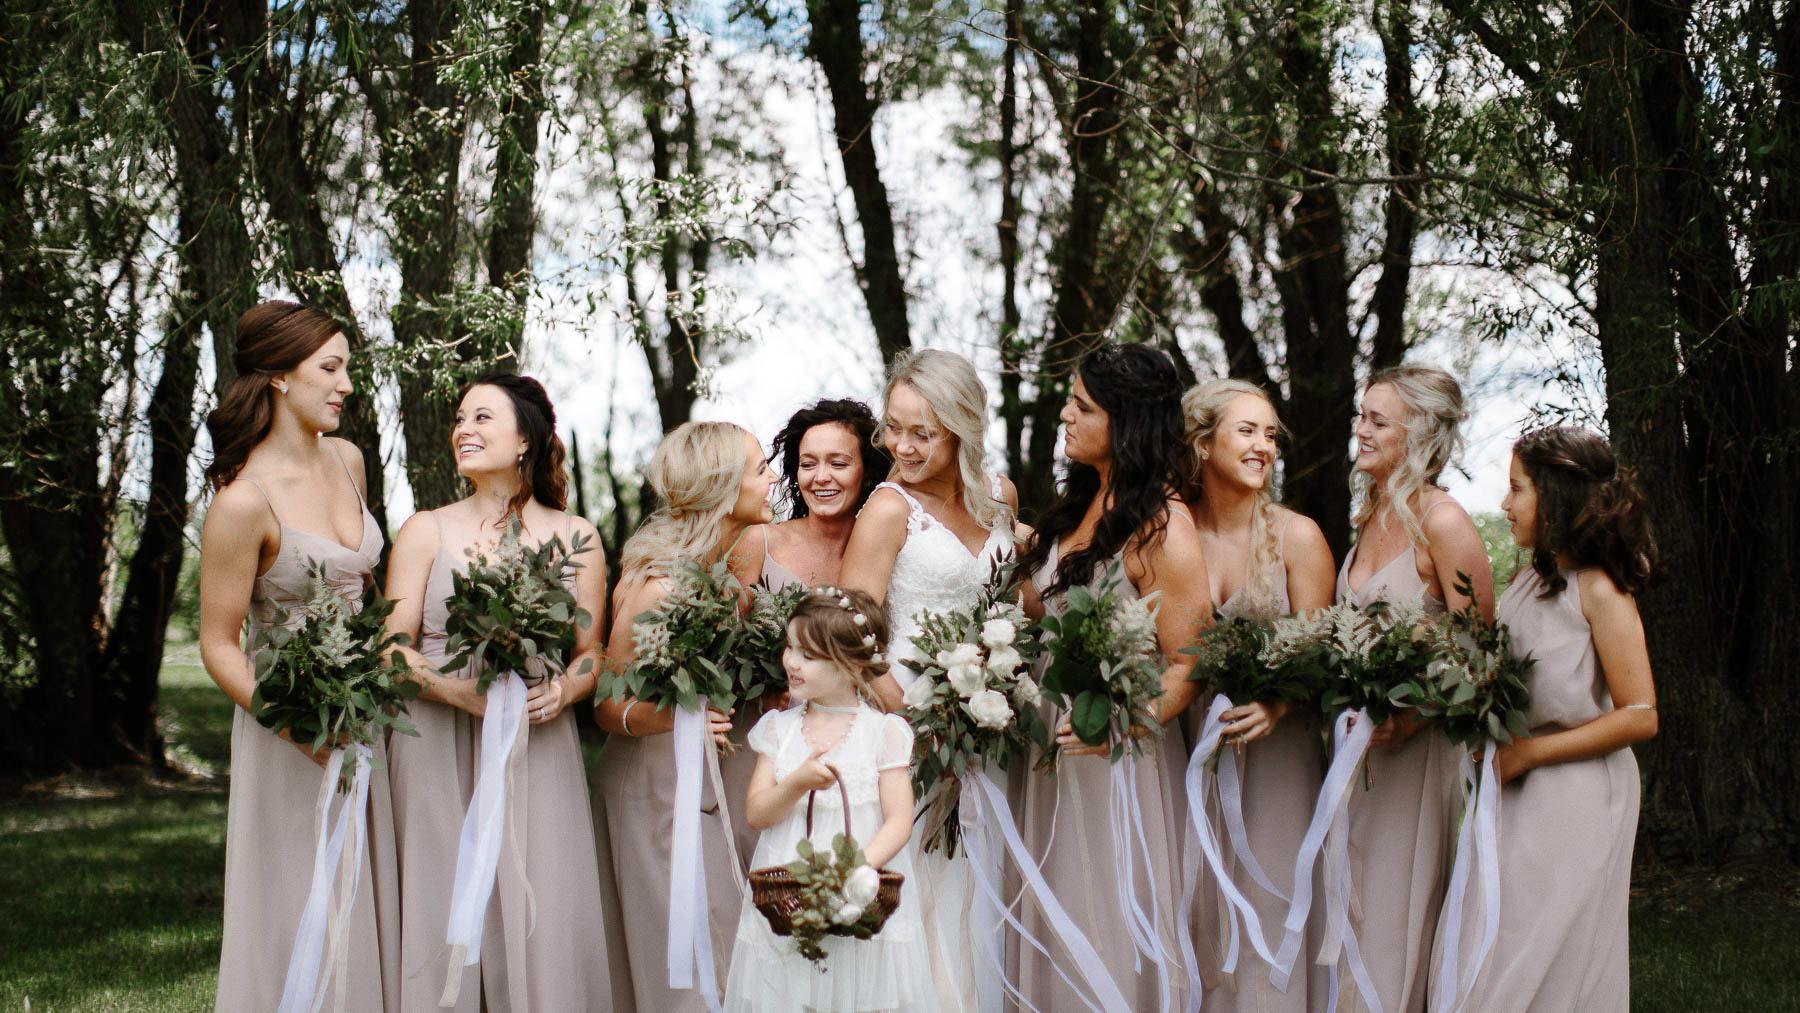 Intimate_Farmhouse_SD_Wedding_Bridgette_Philip_030.jpg